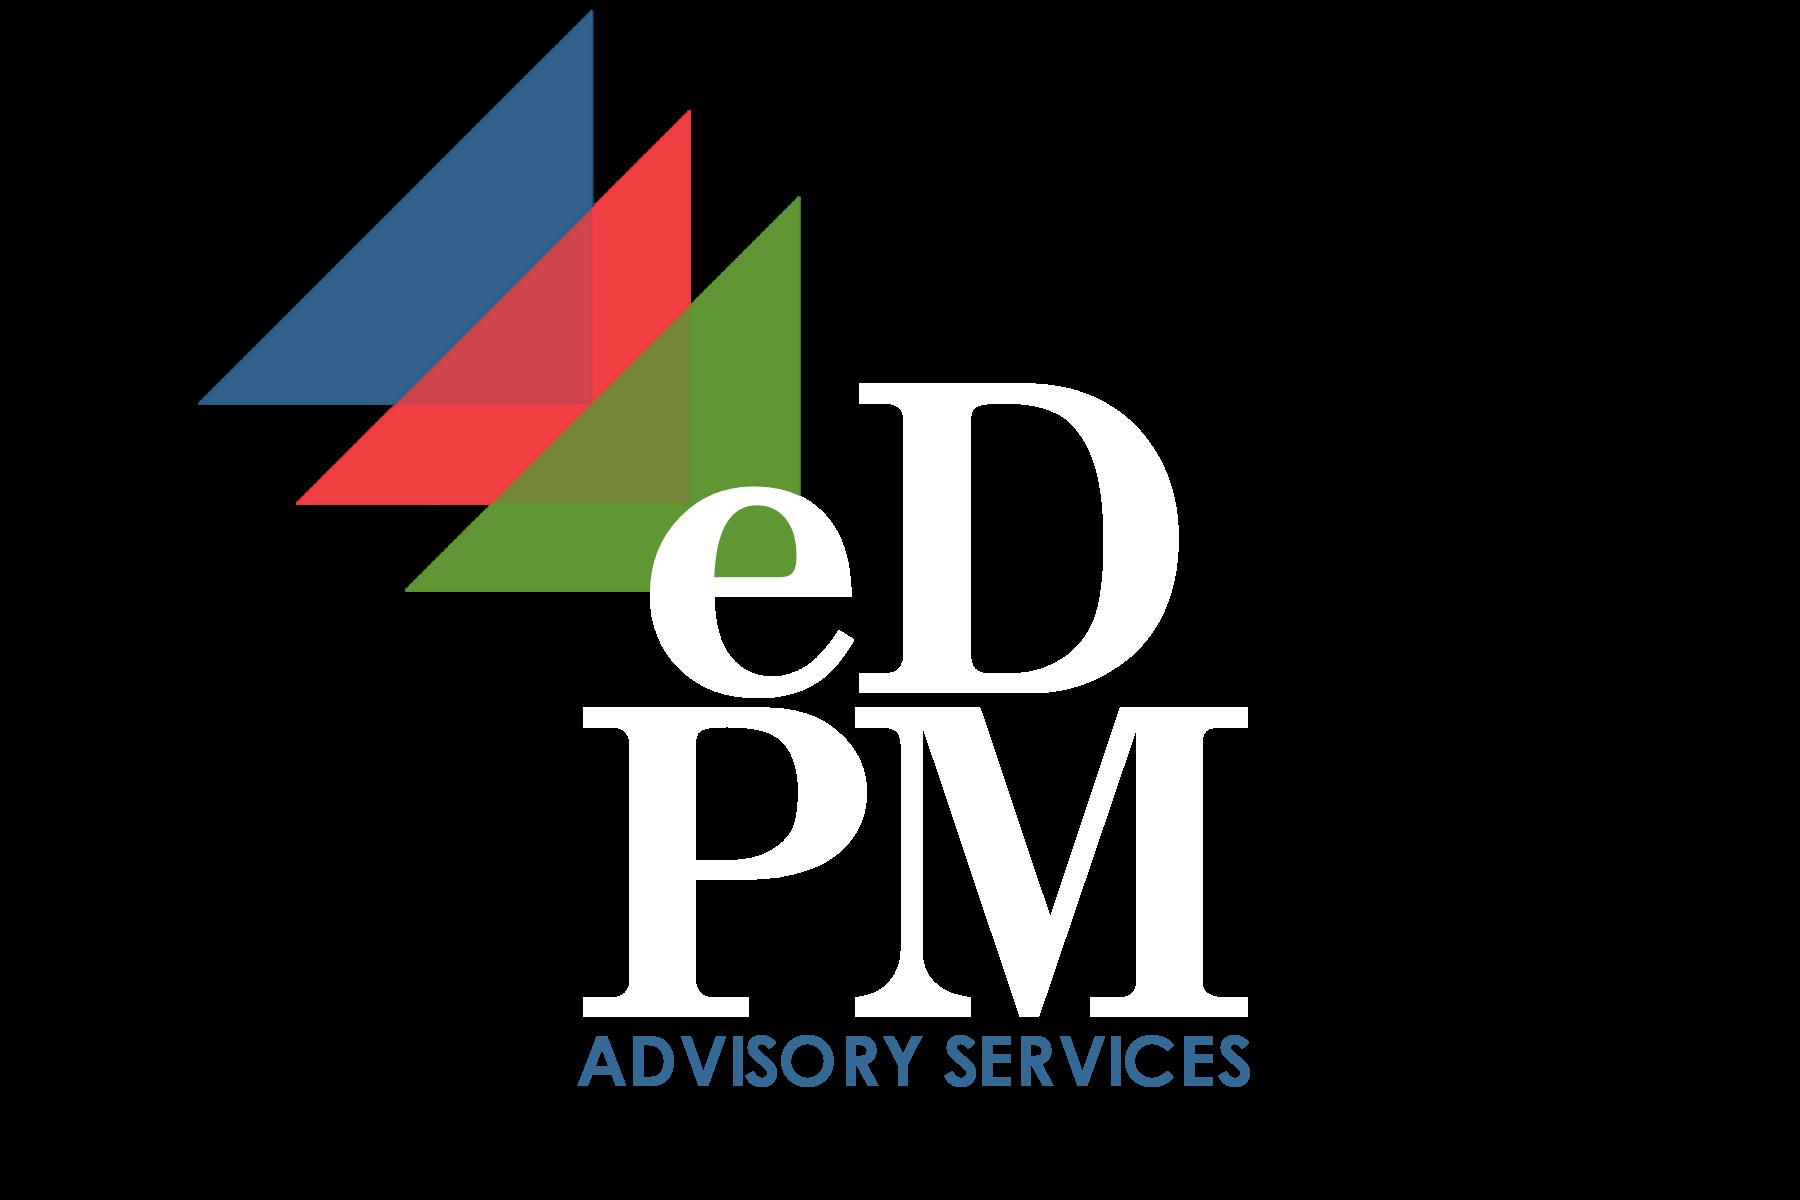 EDPM Advisory Services logo